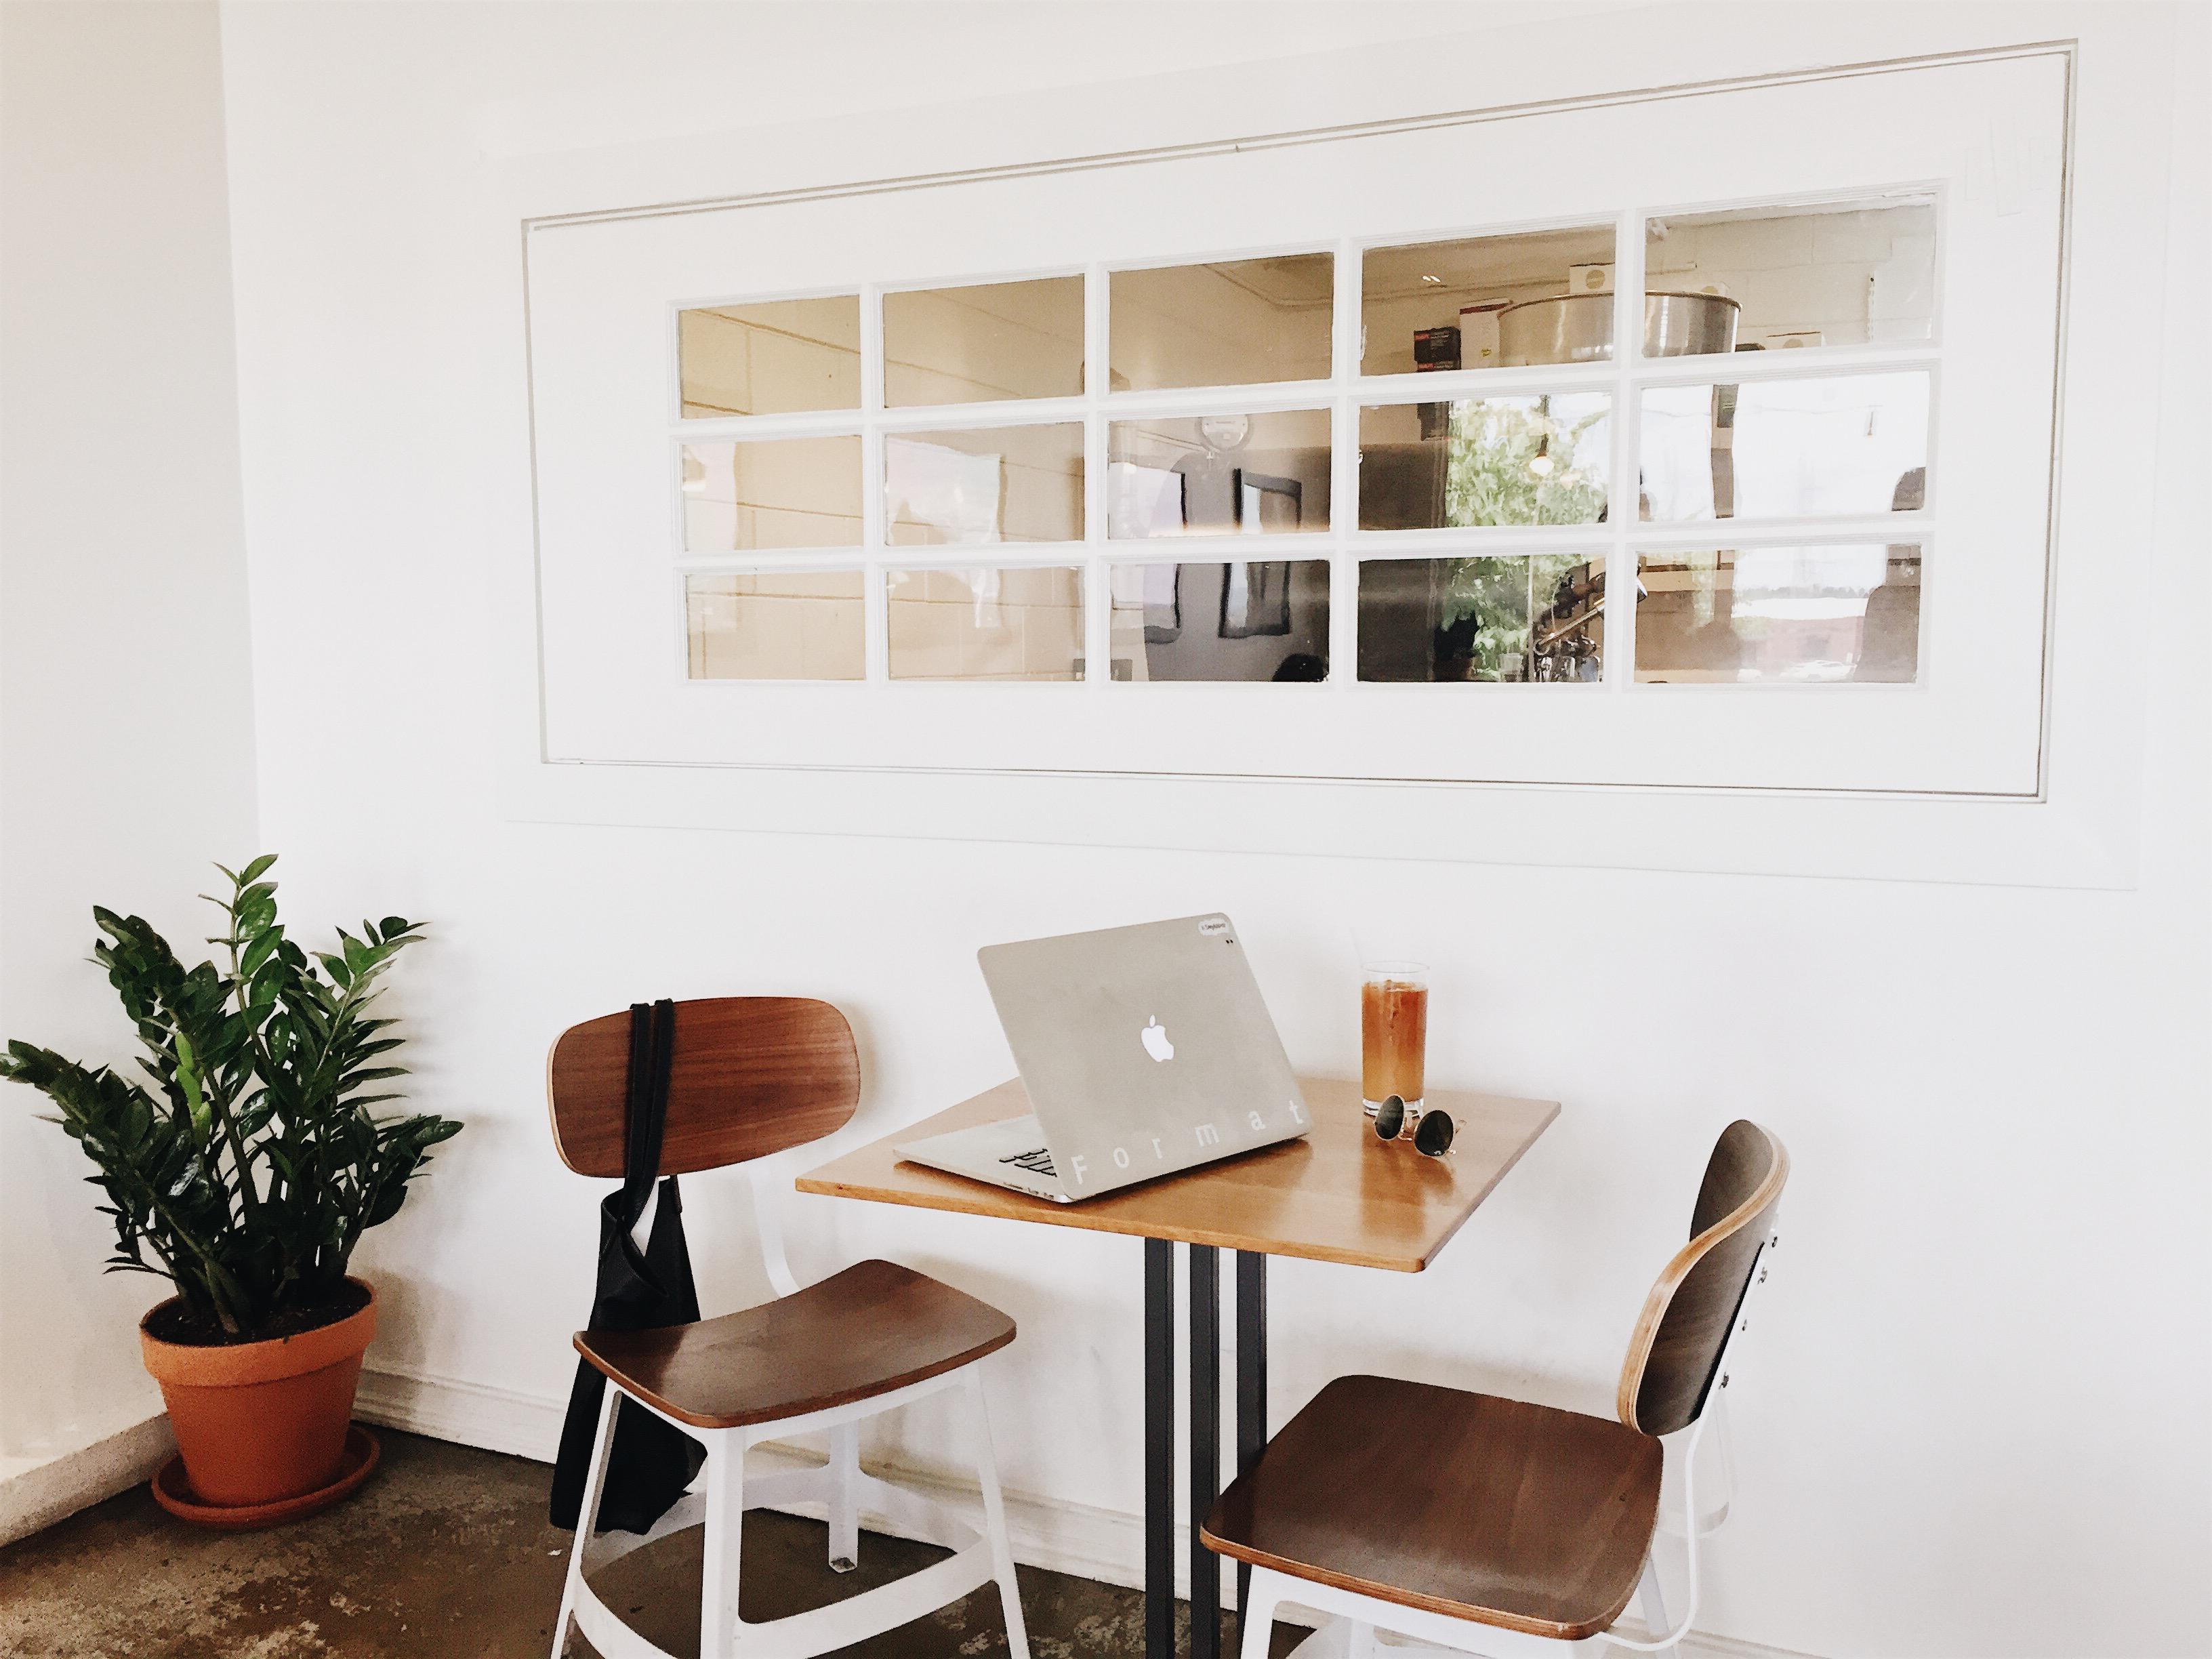 MacBook on Brown Wood Dining Table